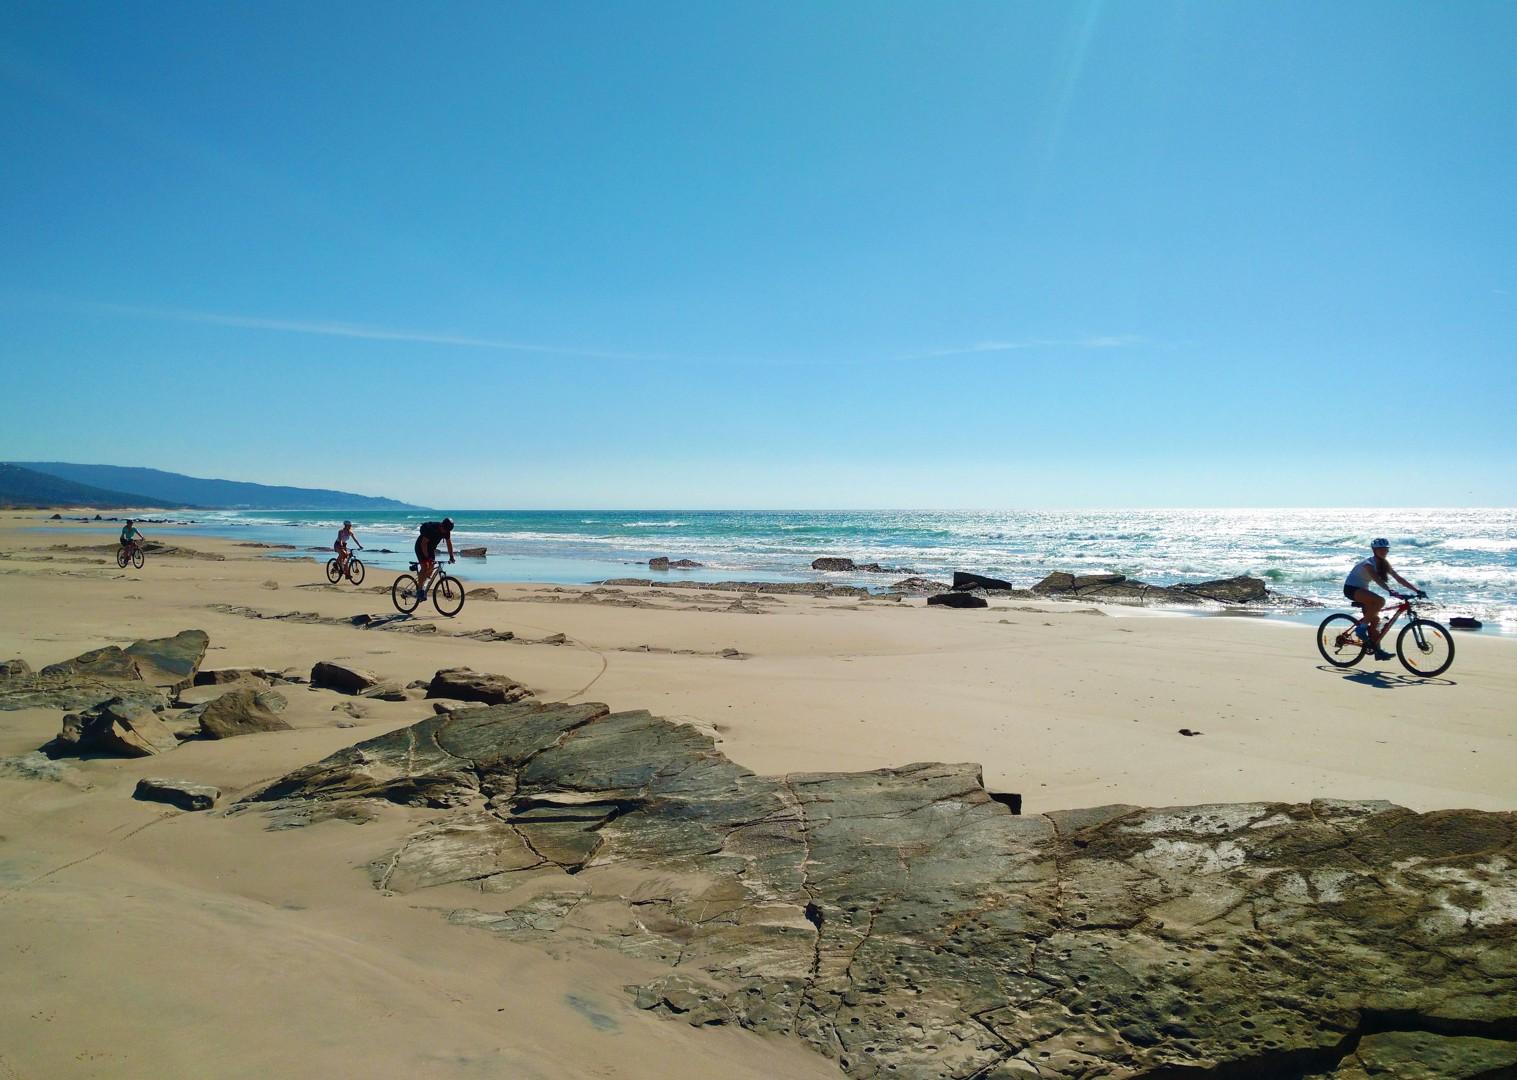 stunning-ocean-views-on-family-holiday-south-of-spain.jpg - Southern Spain - Coastal Adventurer - Self-Guided Family Cycling Holiday - Family Cycling